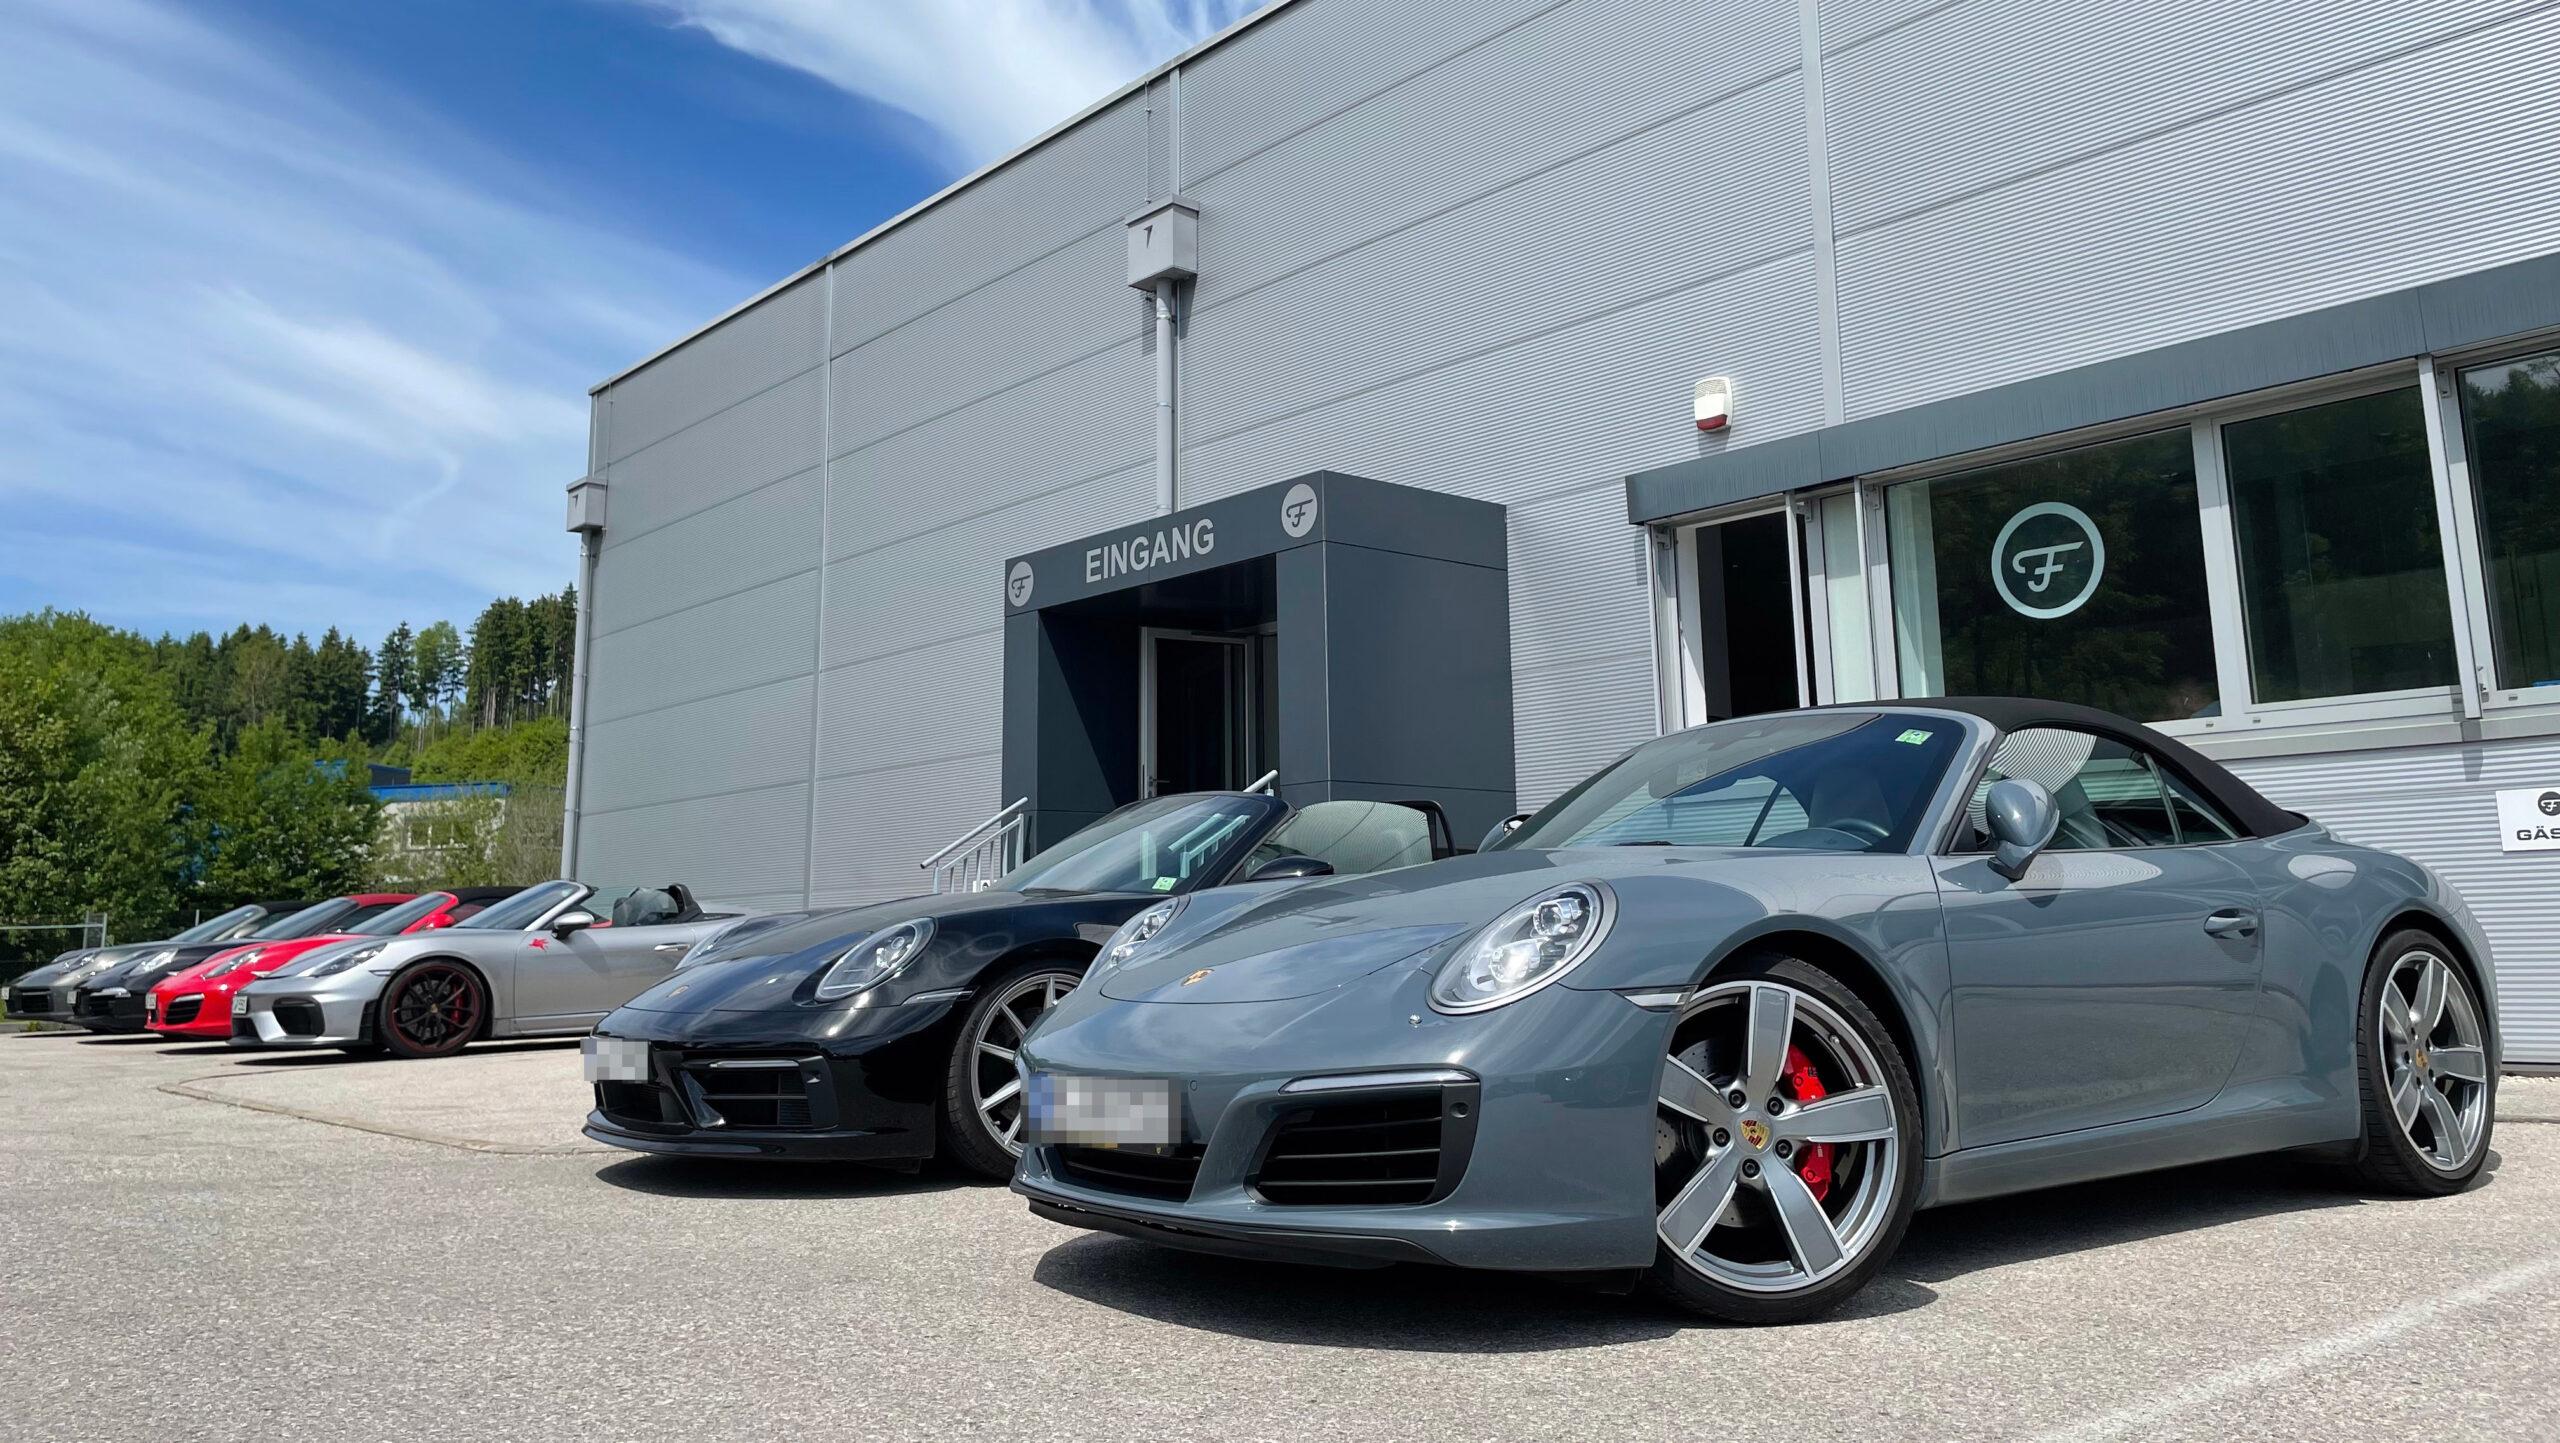 Porsche Club Monasteria